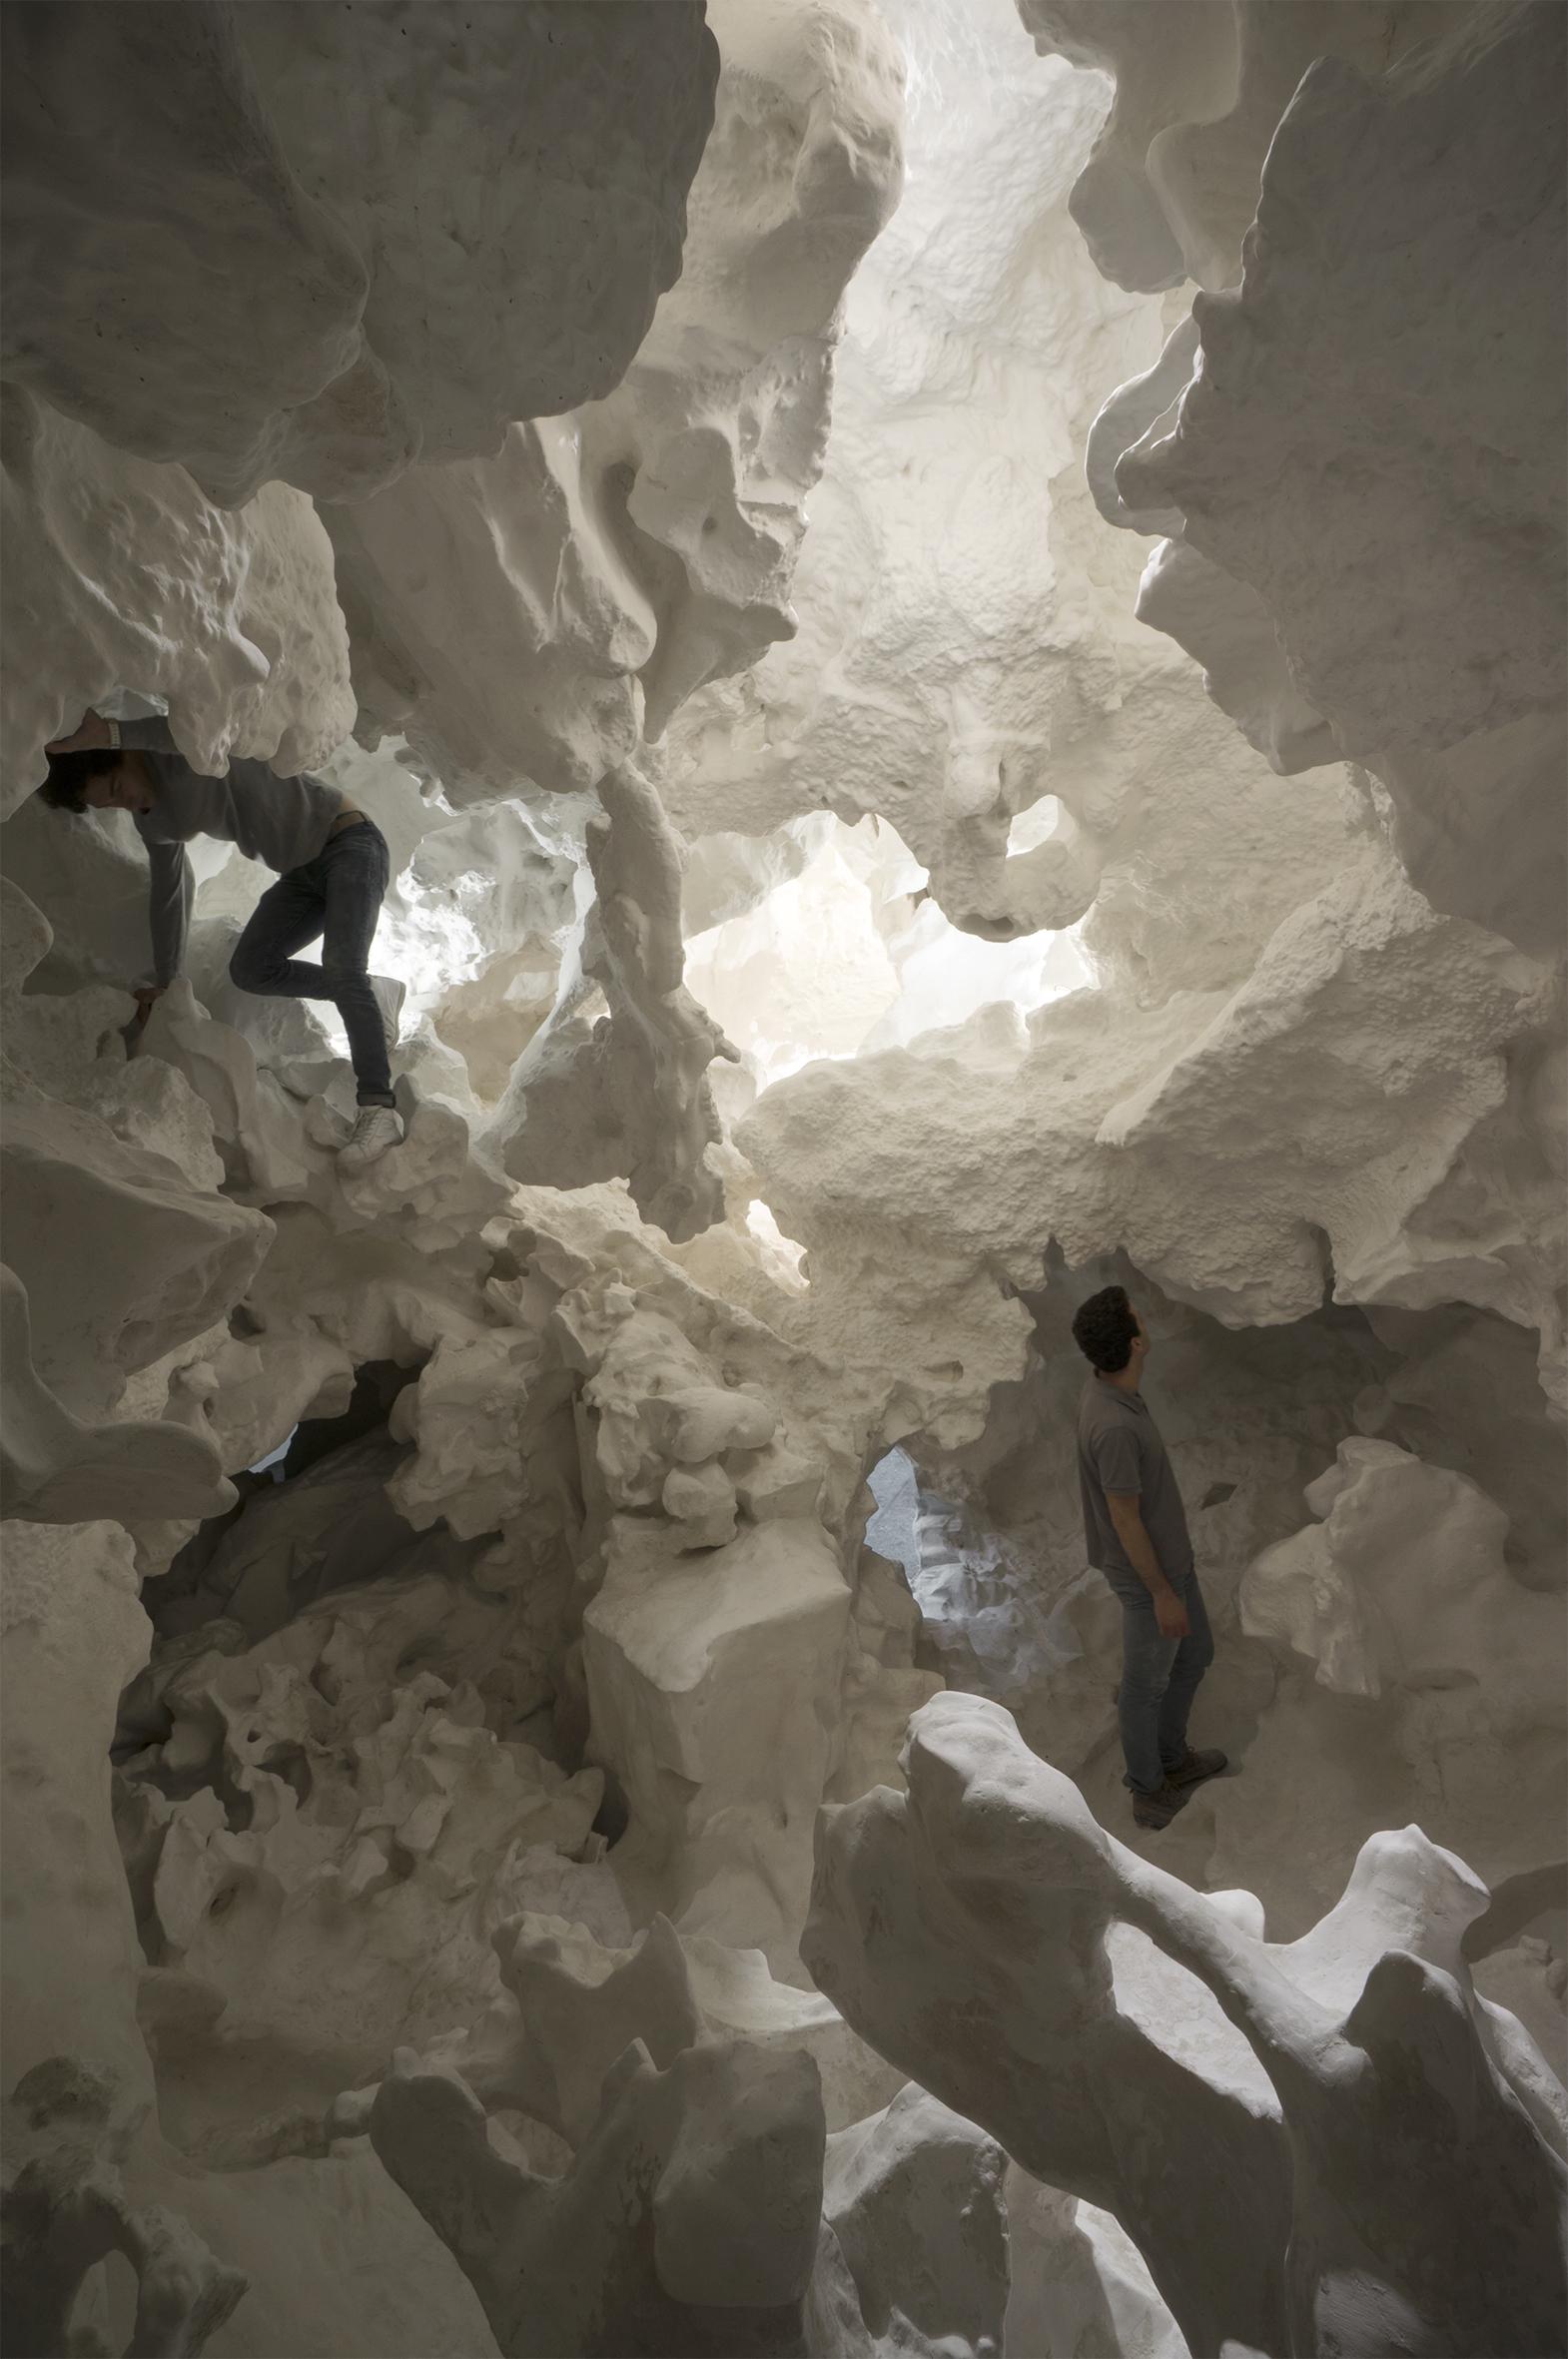 Incidental Space, Pavilion of Switzerland,  15th International Architecture Biennale in Venice